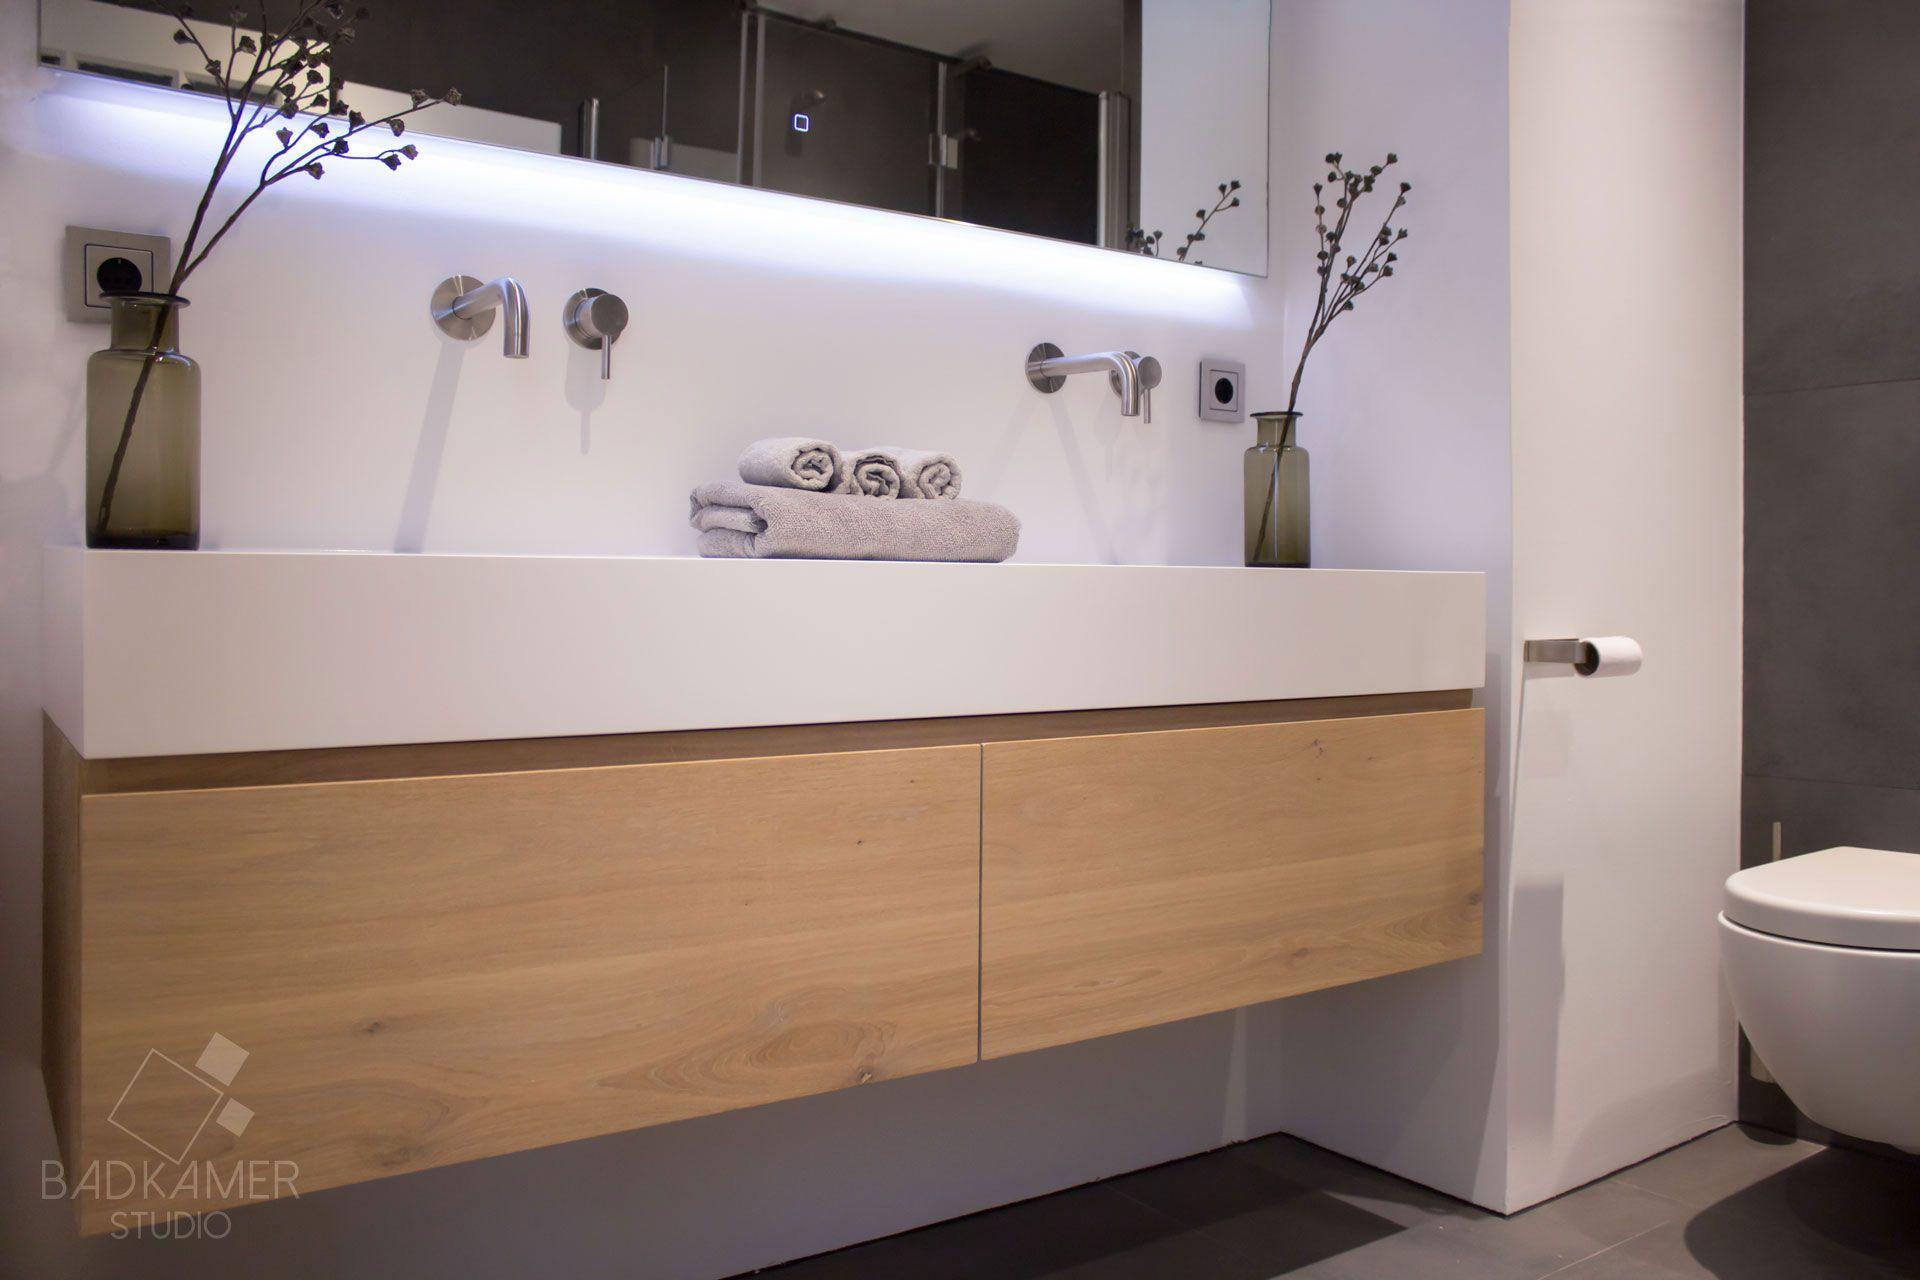 Uniek Onderbouwkasten Badkamer - Badkamermeubels Ontwerpen 2017